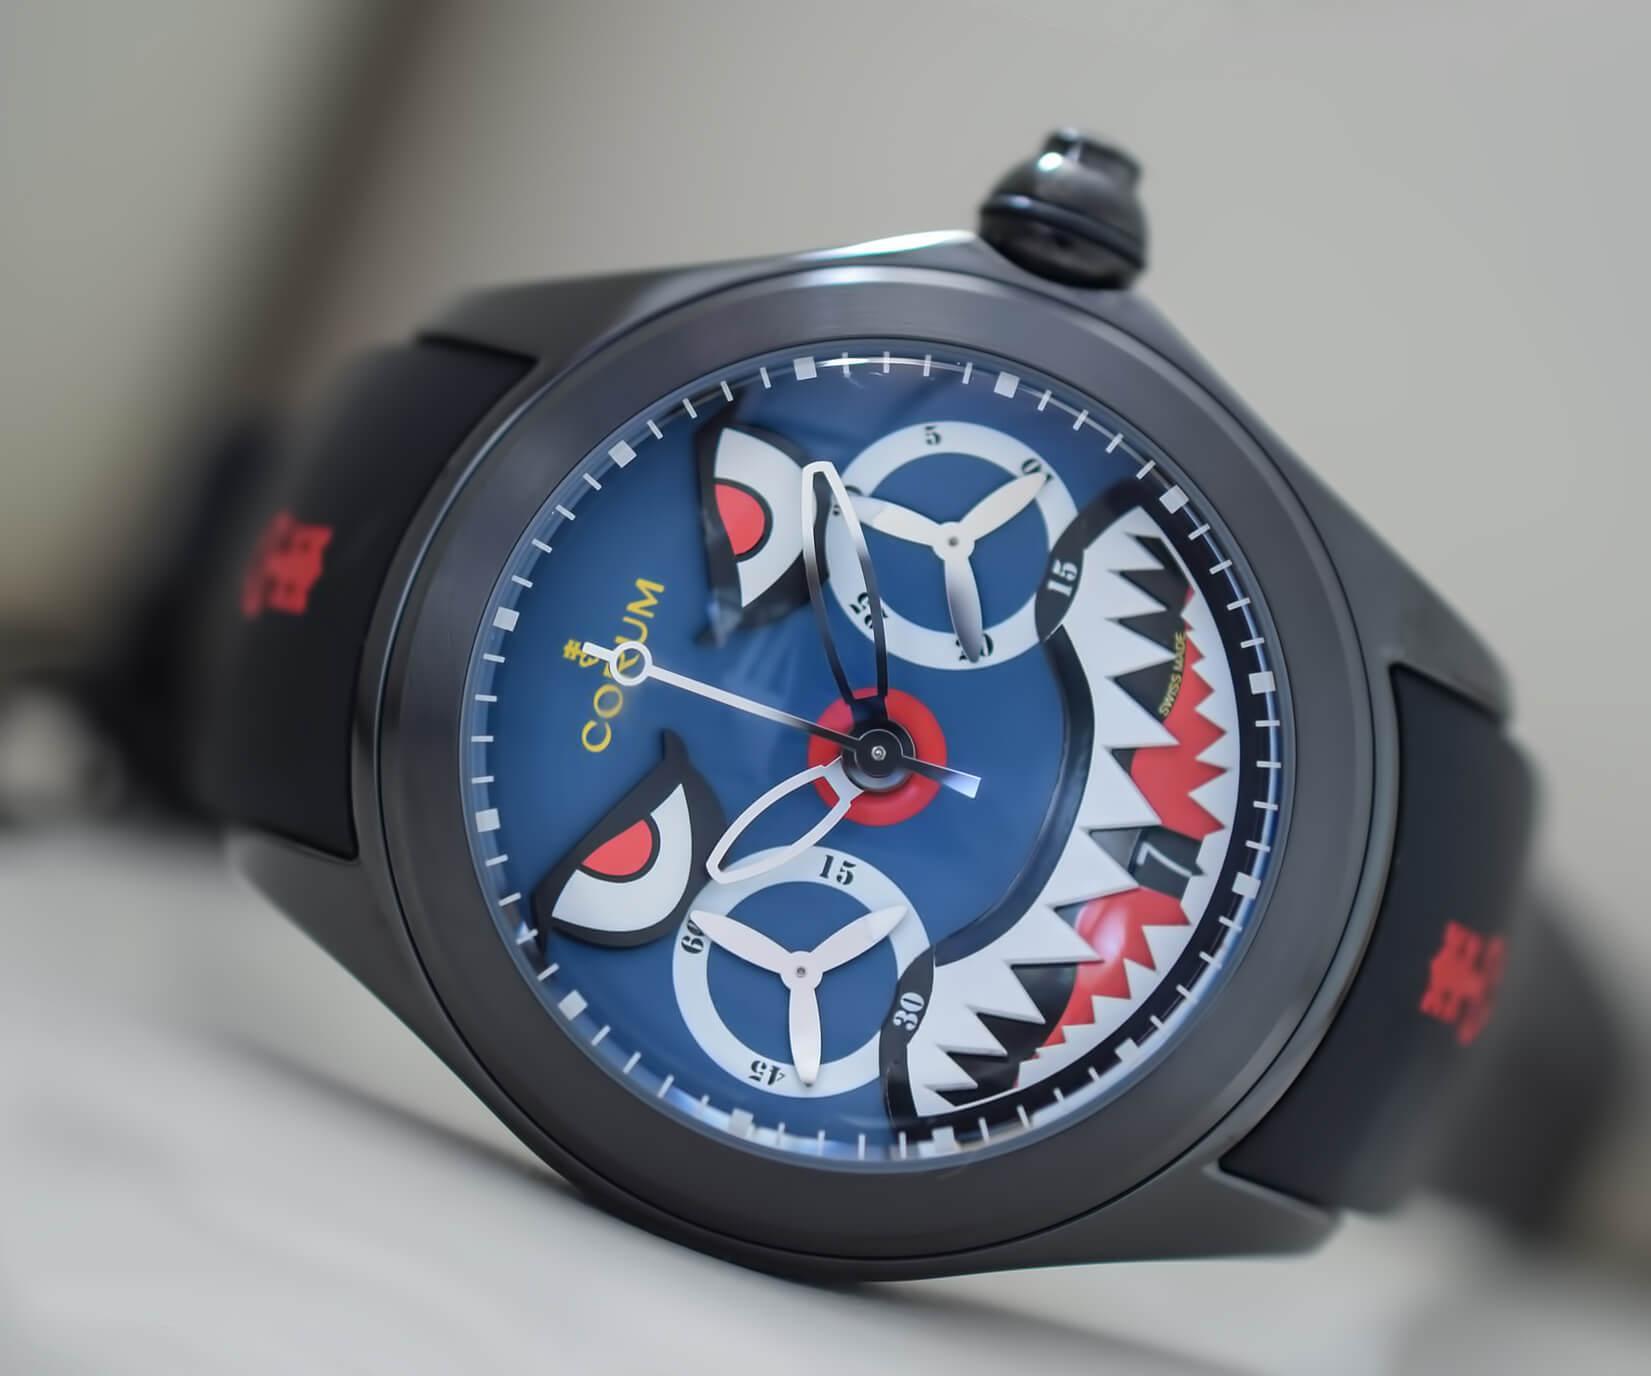 Мужские швейцарские часы Corum Bubble Shark Mono-Pusher Chronograph